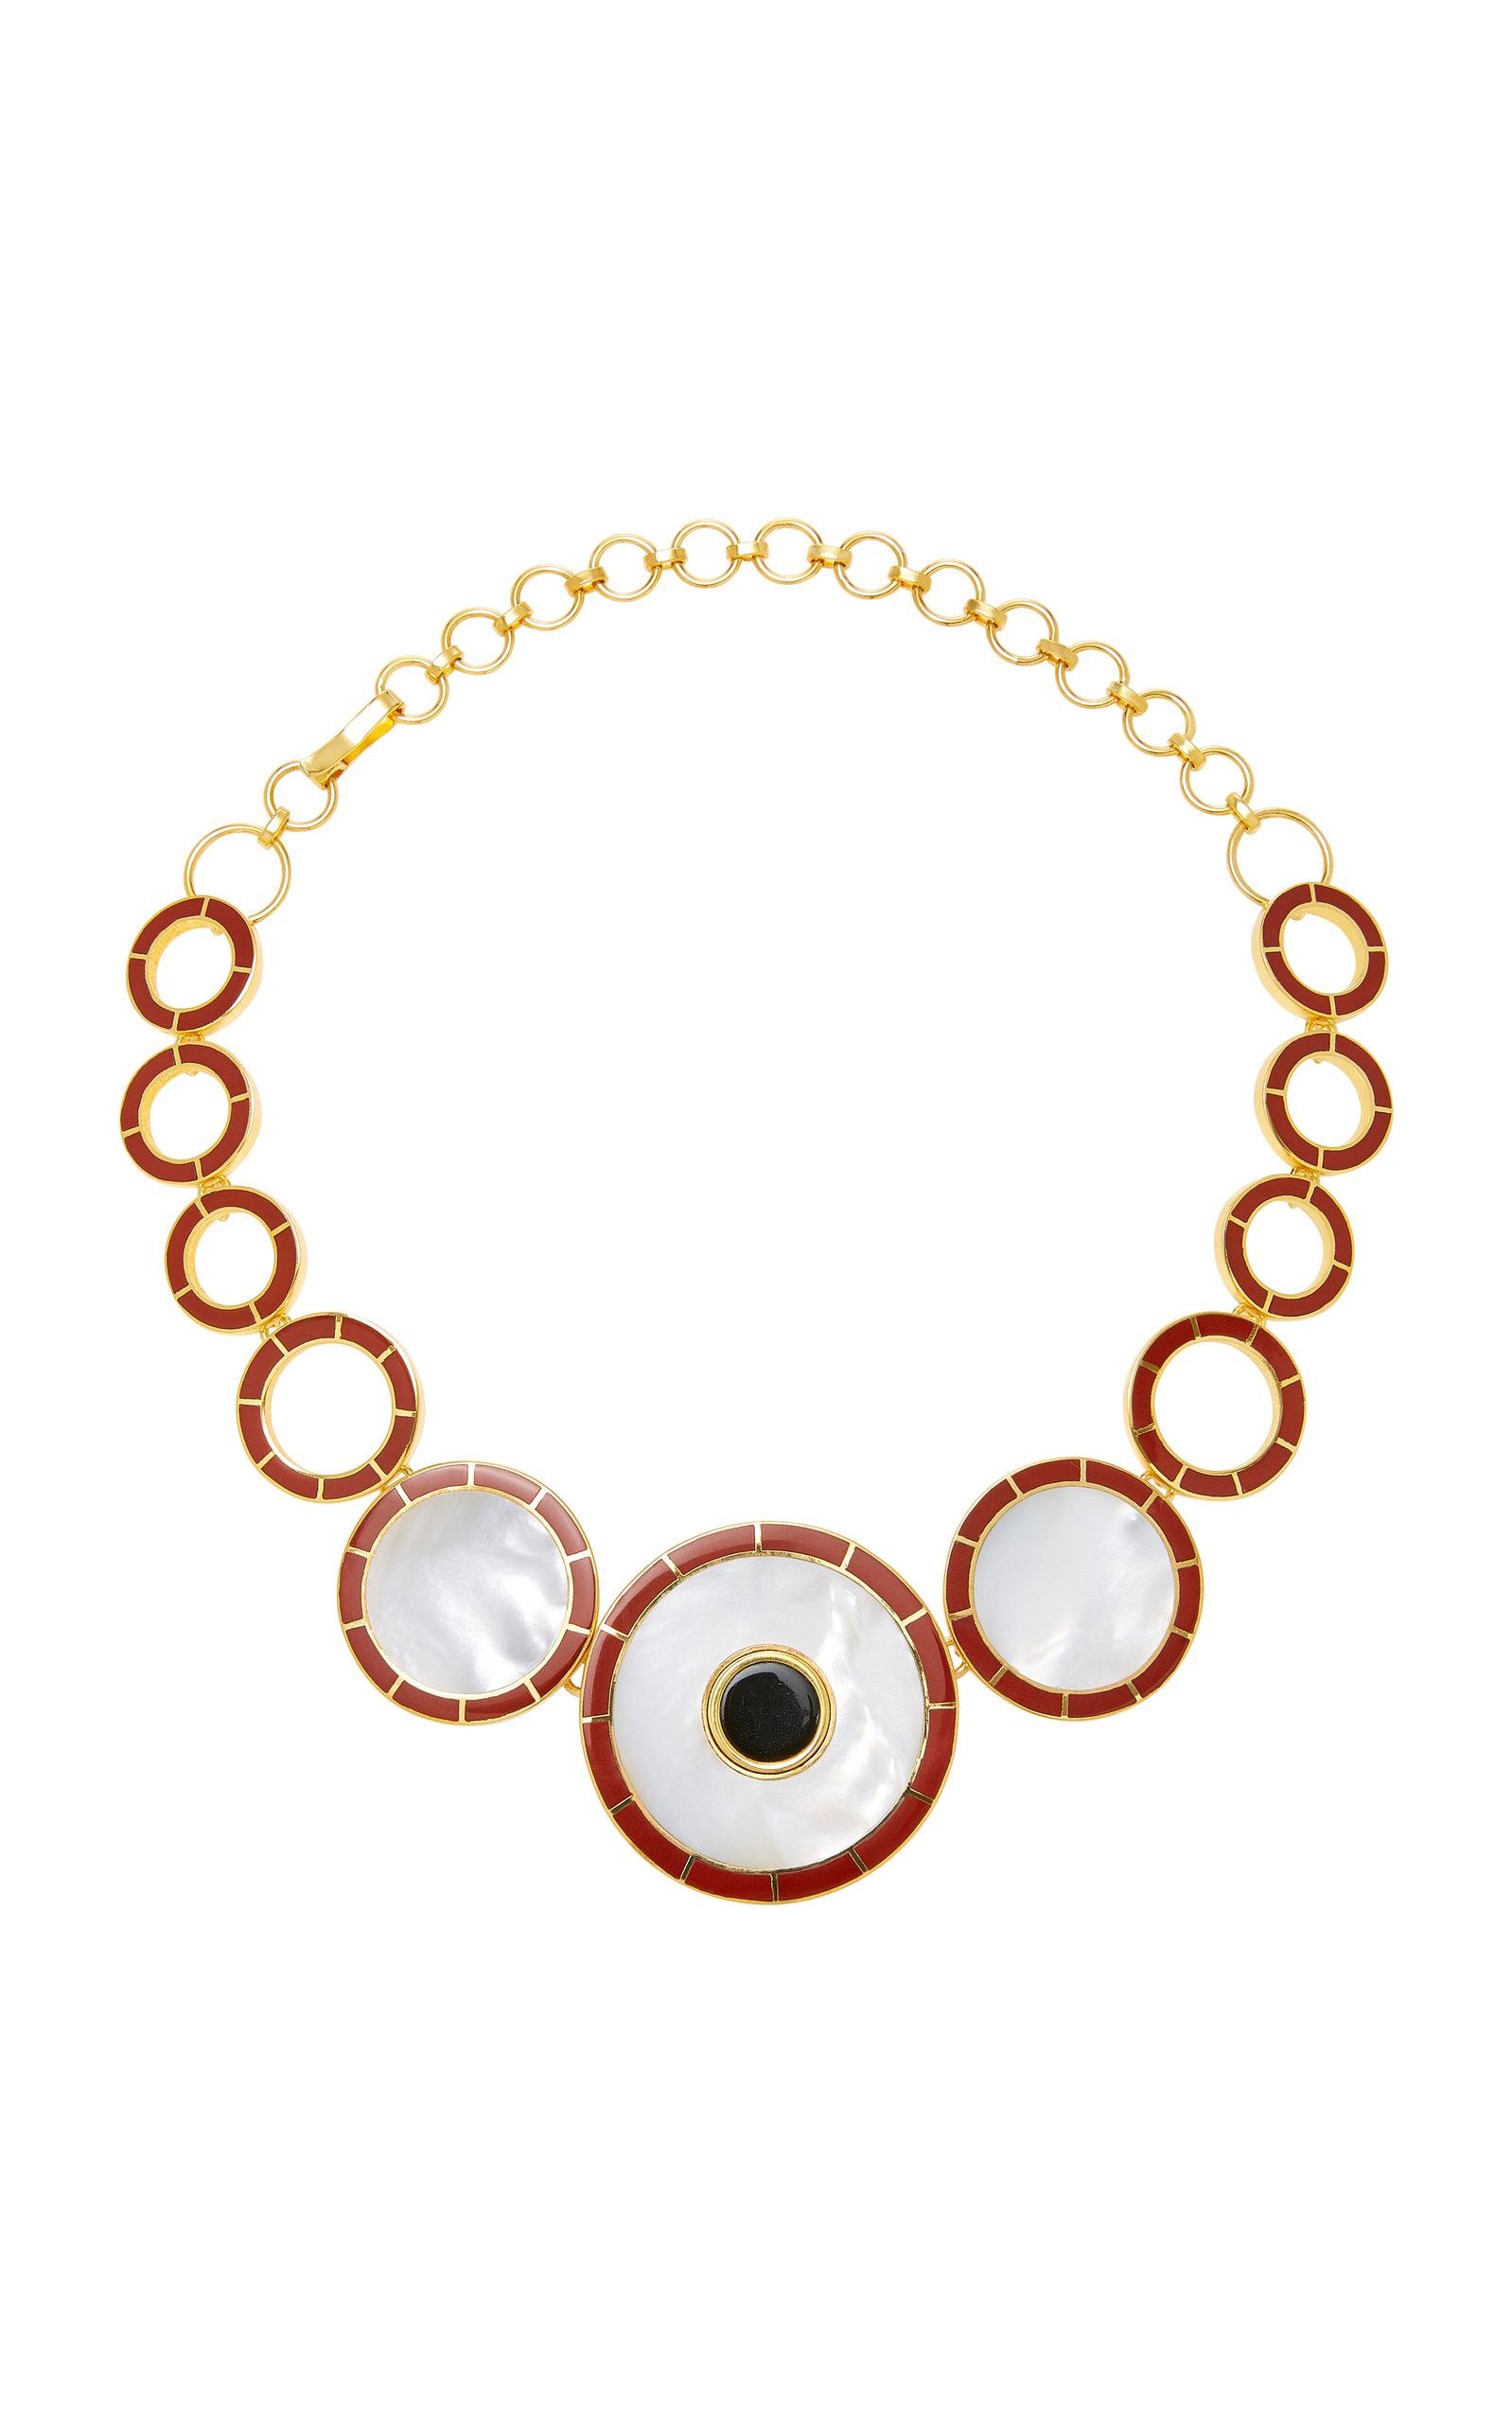 Monica Sordo Brujo Orbit Necklace 3N3uwWbTI